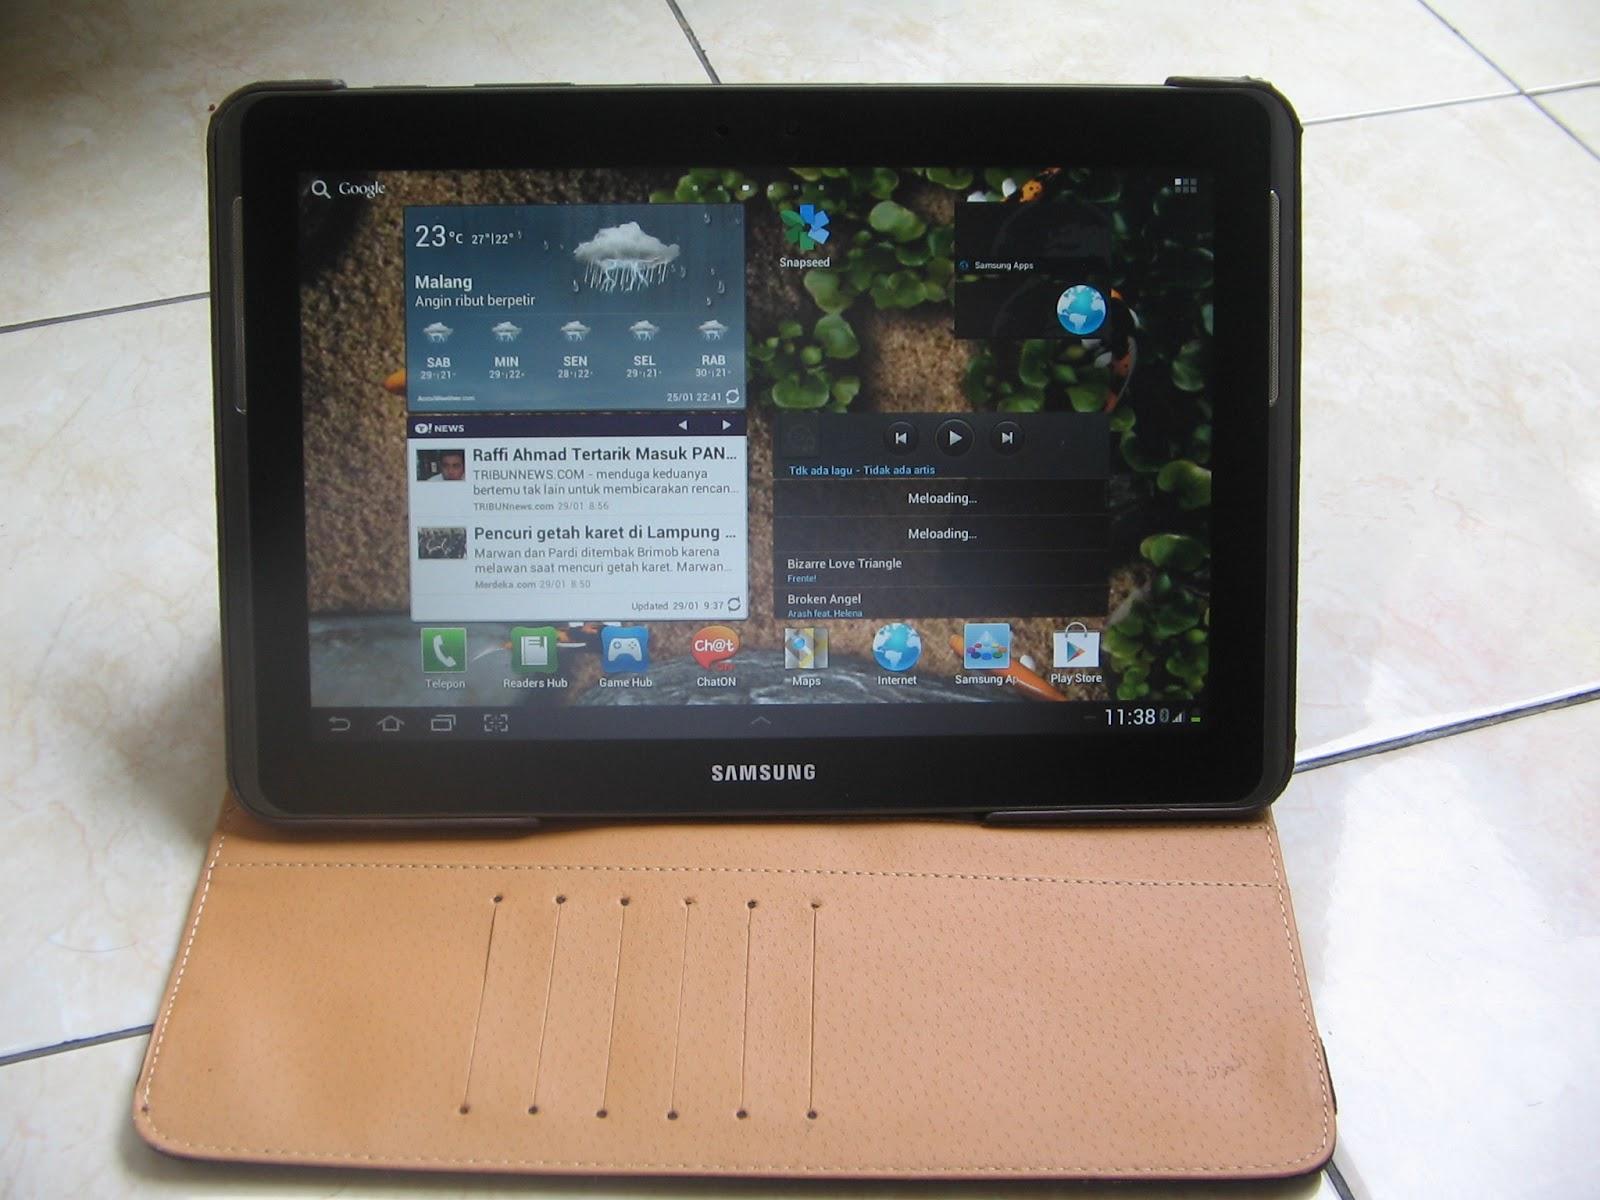 Harga Jual Tablet Samsung Galaxy Tab 3 Bekas